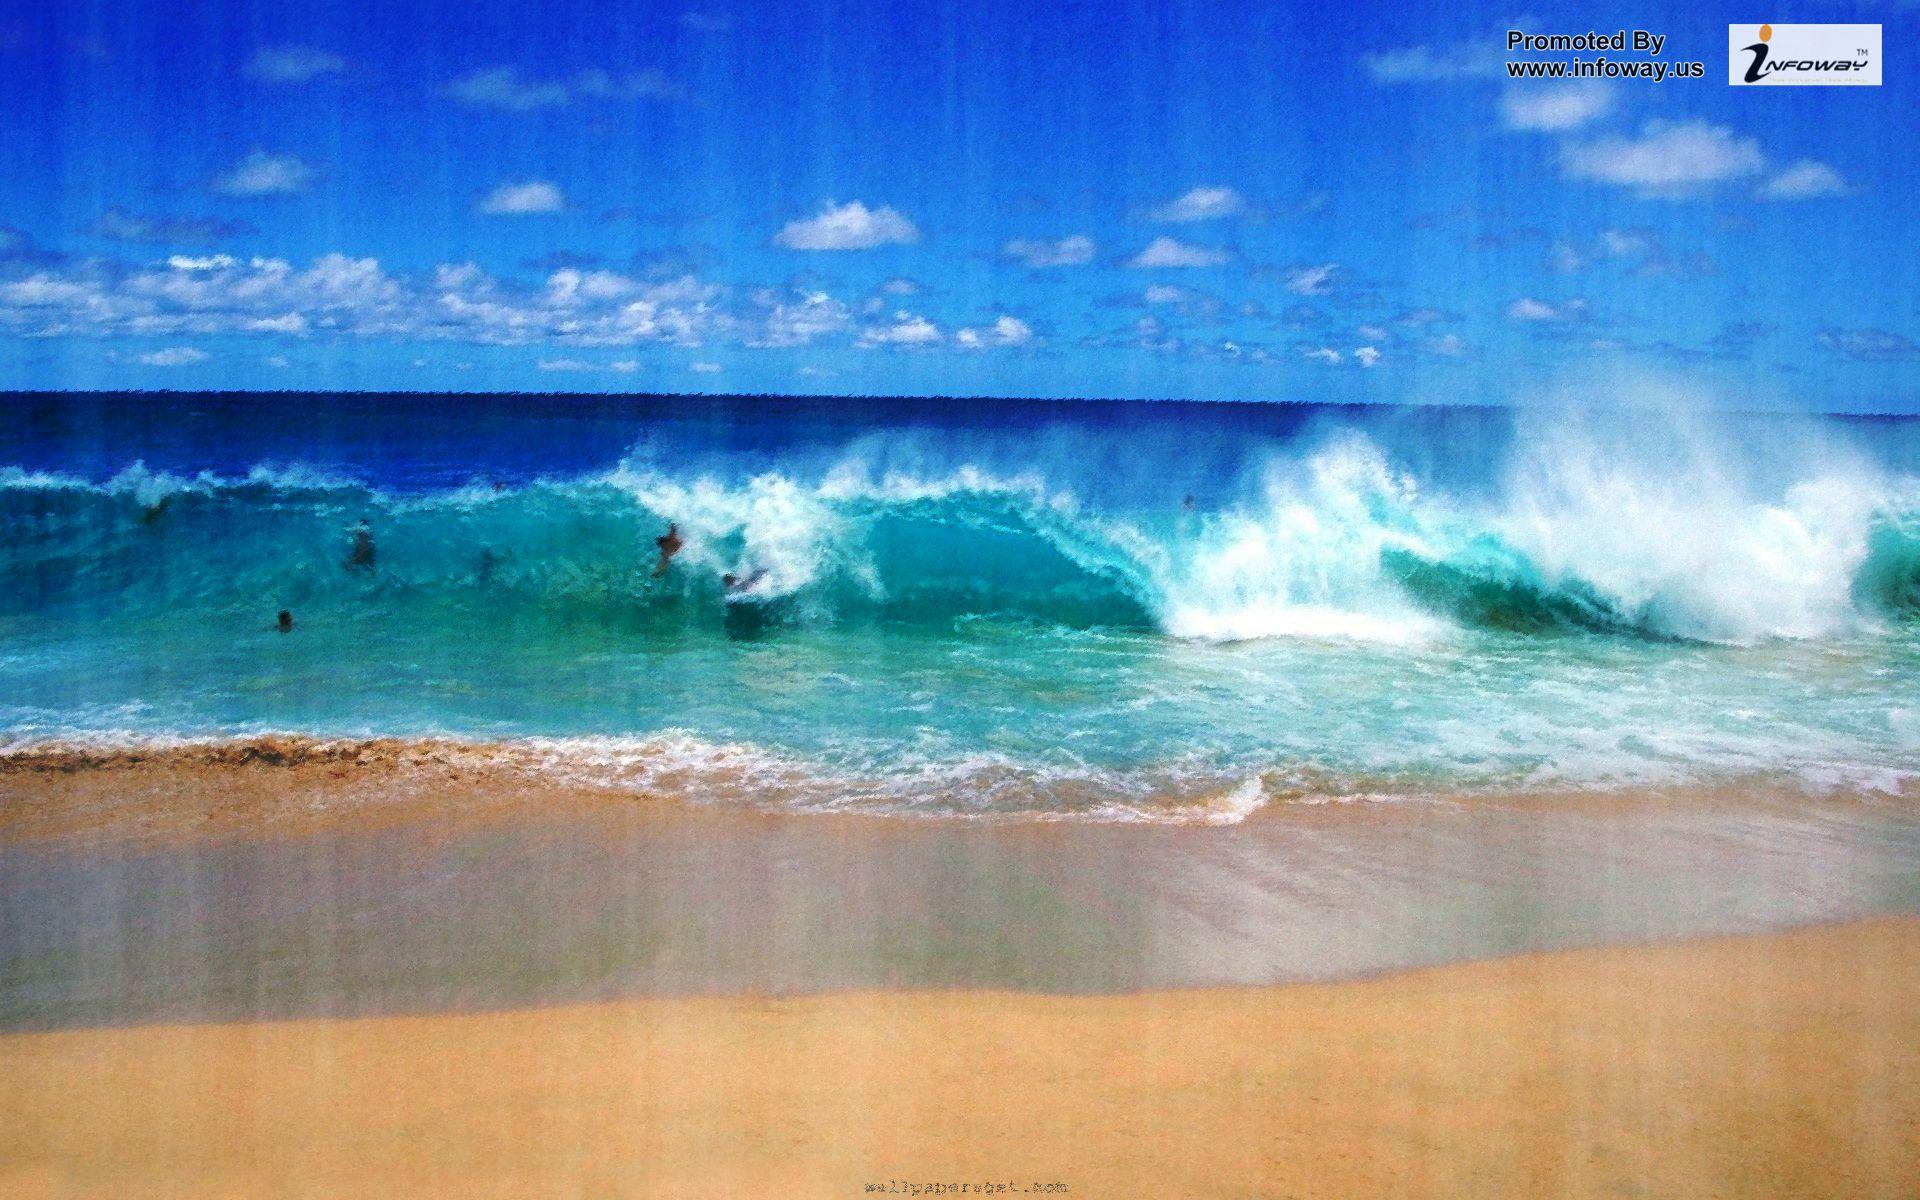 the beautiful seaside scenery - photo #17